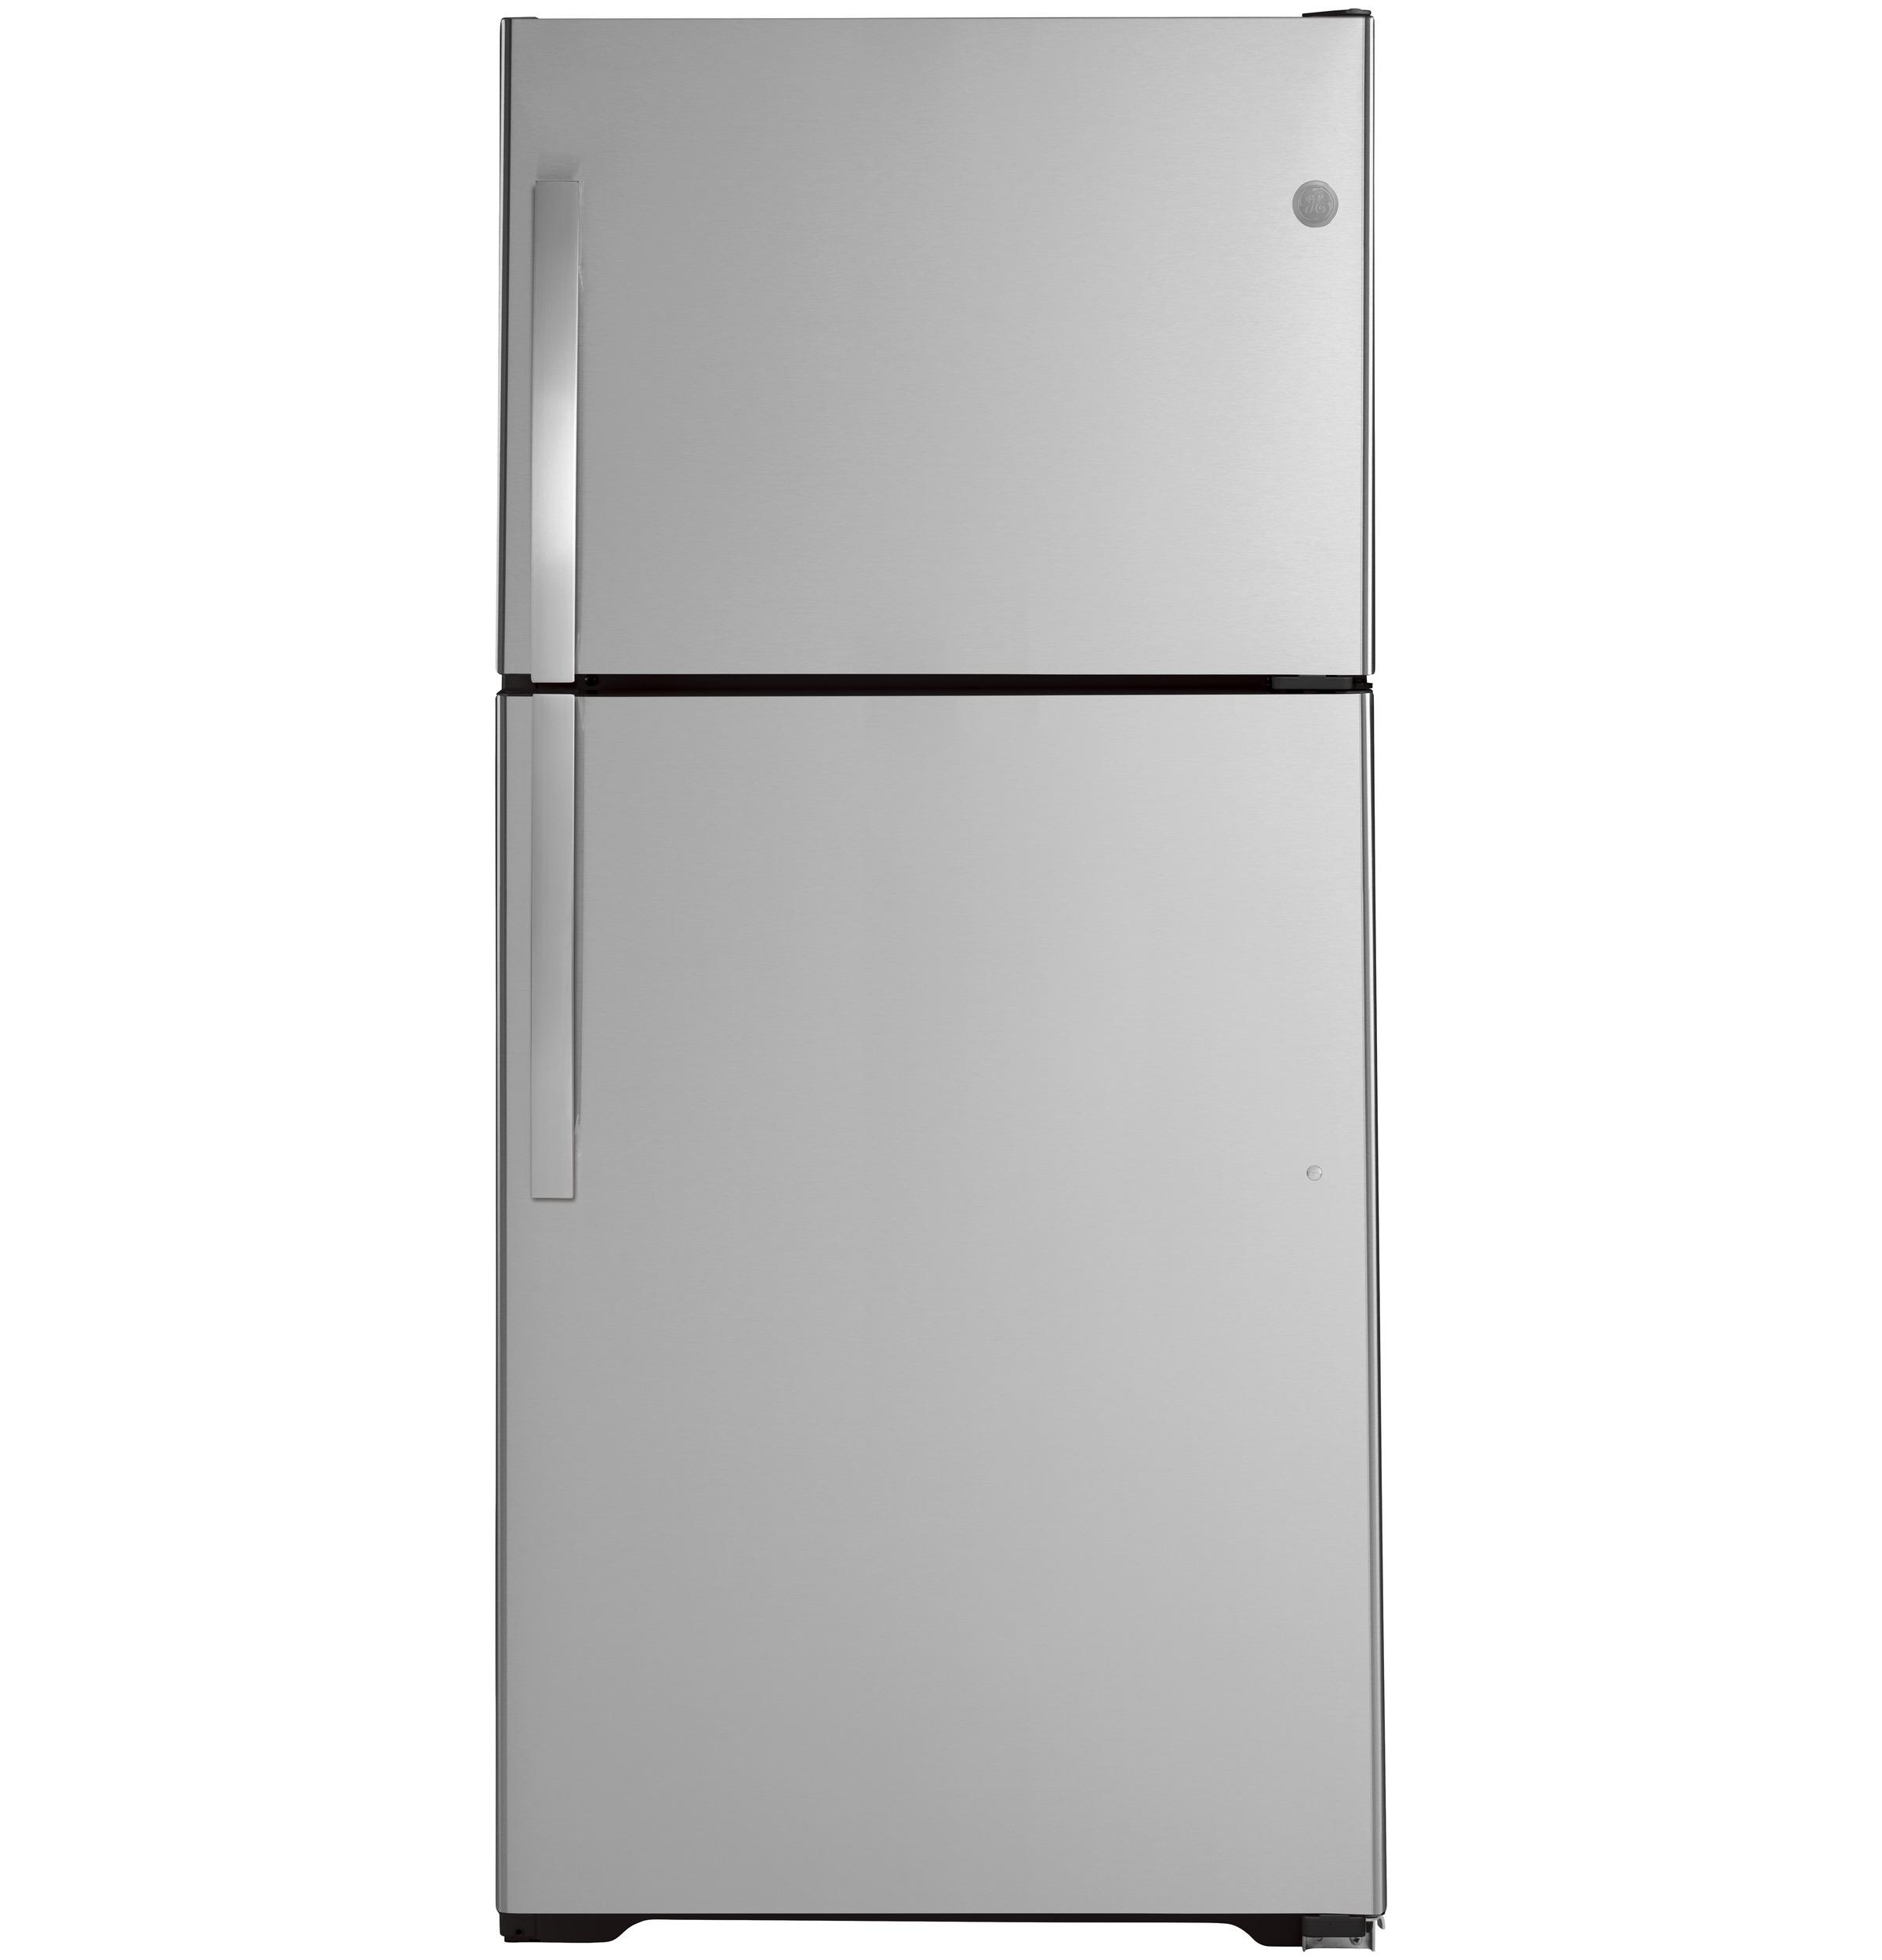 GE GE® 19.2 Cu. Ft. Top-Freezer Refrigerator